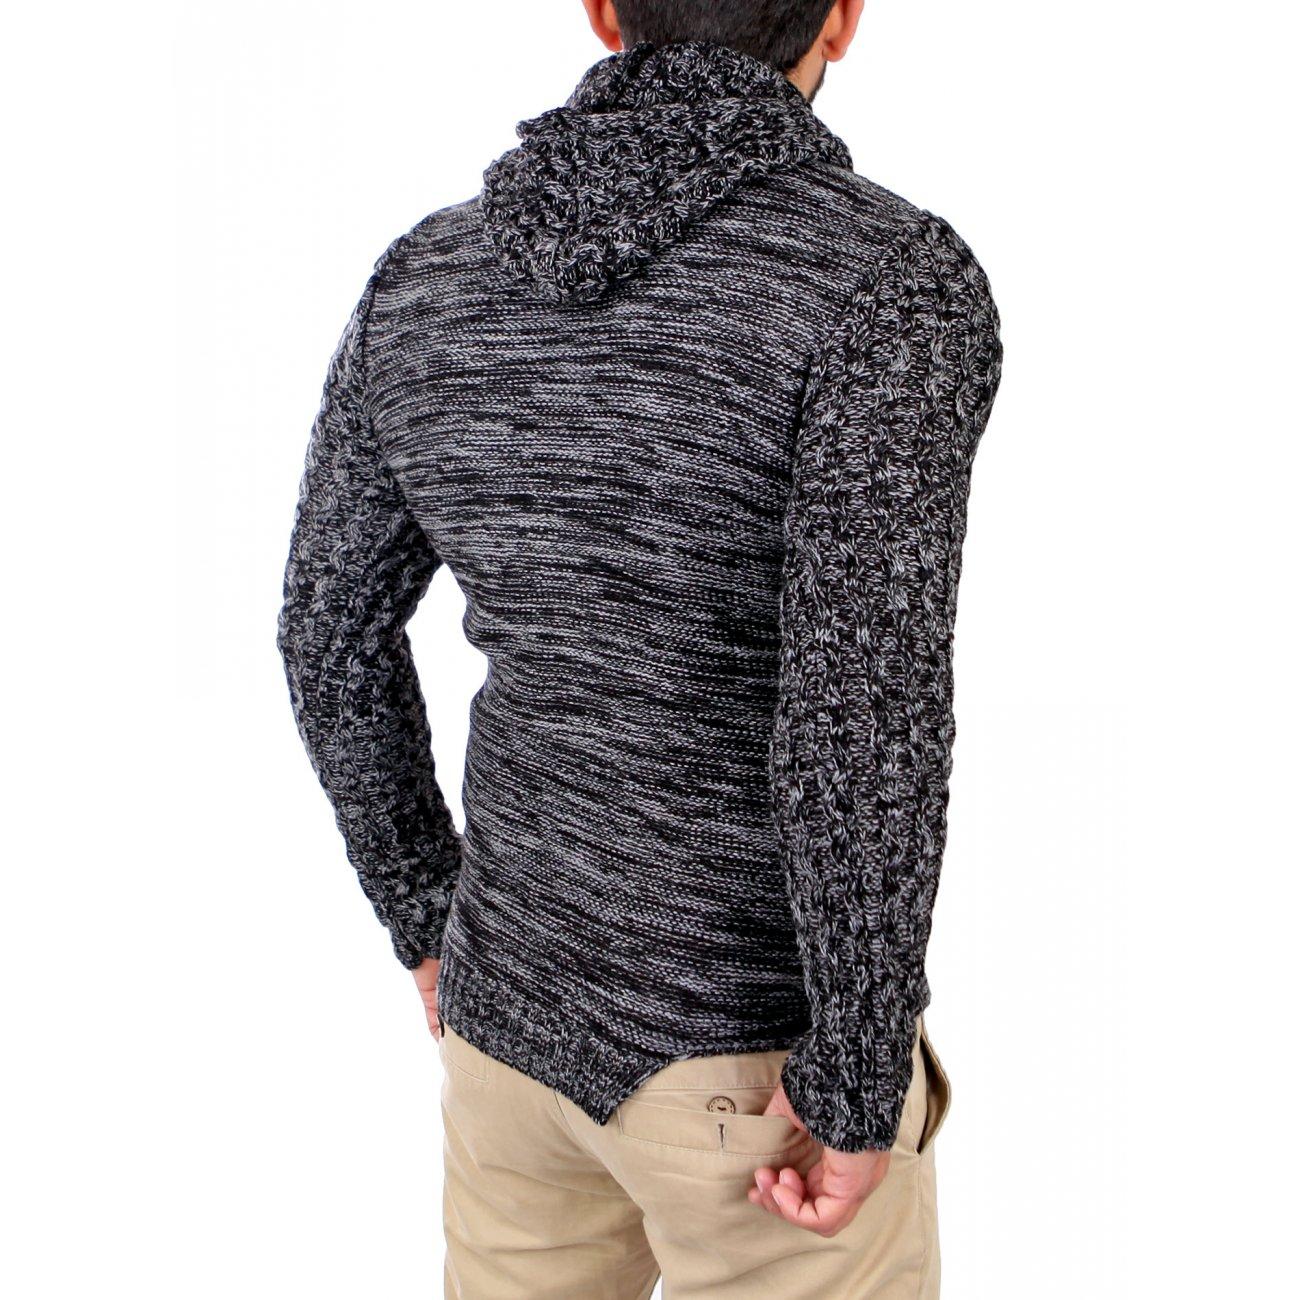 carisma herren kapuzen strickjacke buttoned mit zipper. Black Bedroom Furniture Sets. Home Design Ideas